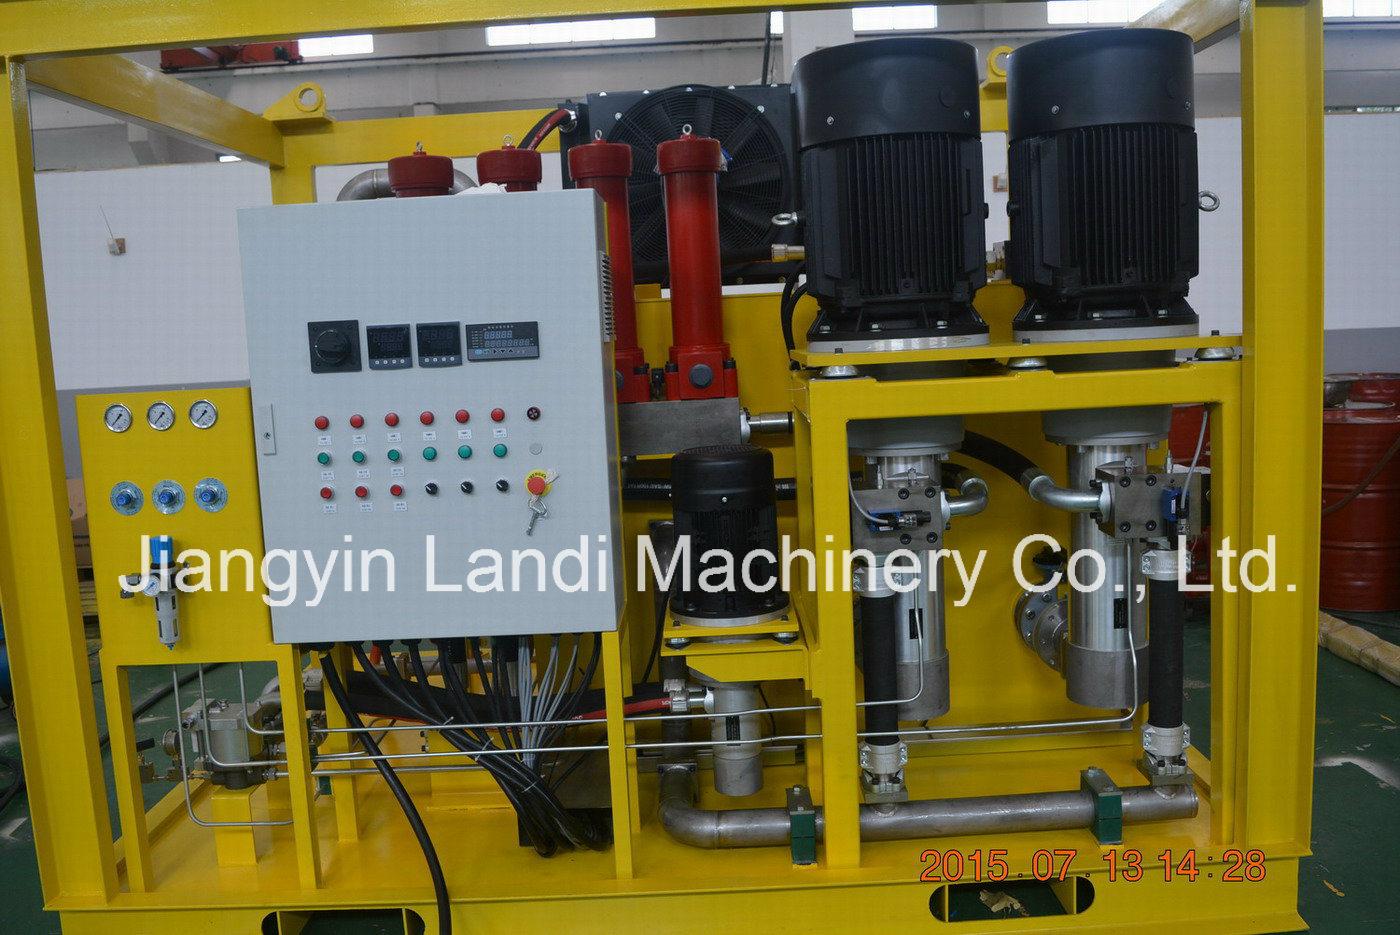 Hydraulic Power Unit (Hydraulic Power Pack) for Heavy Industry